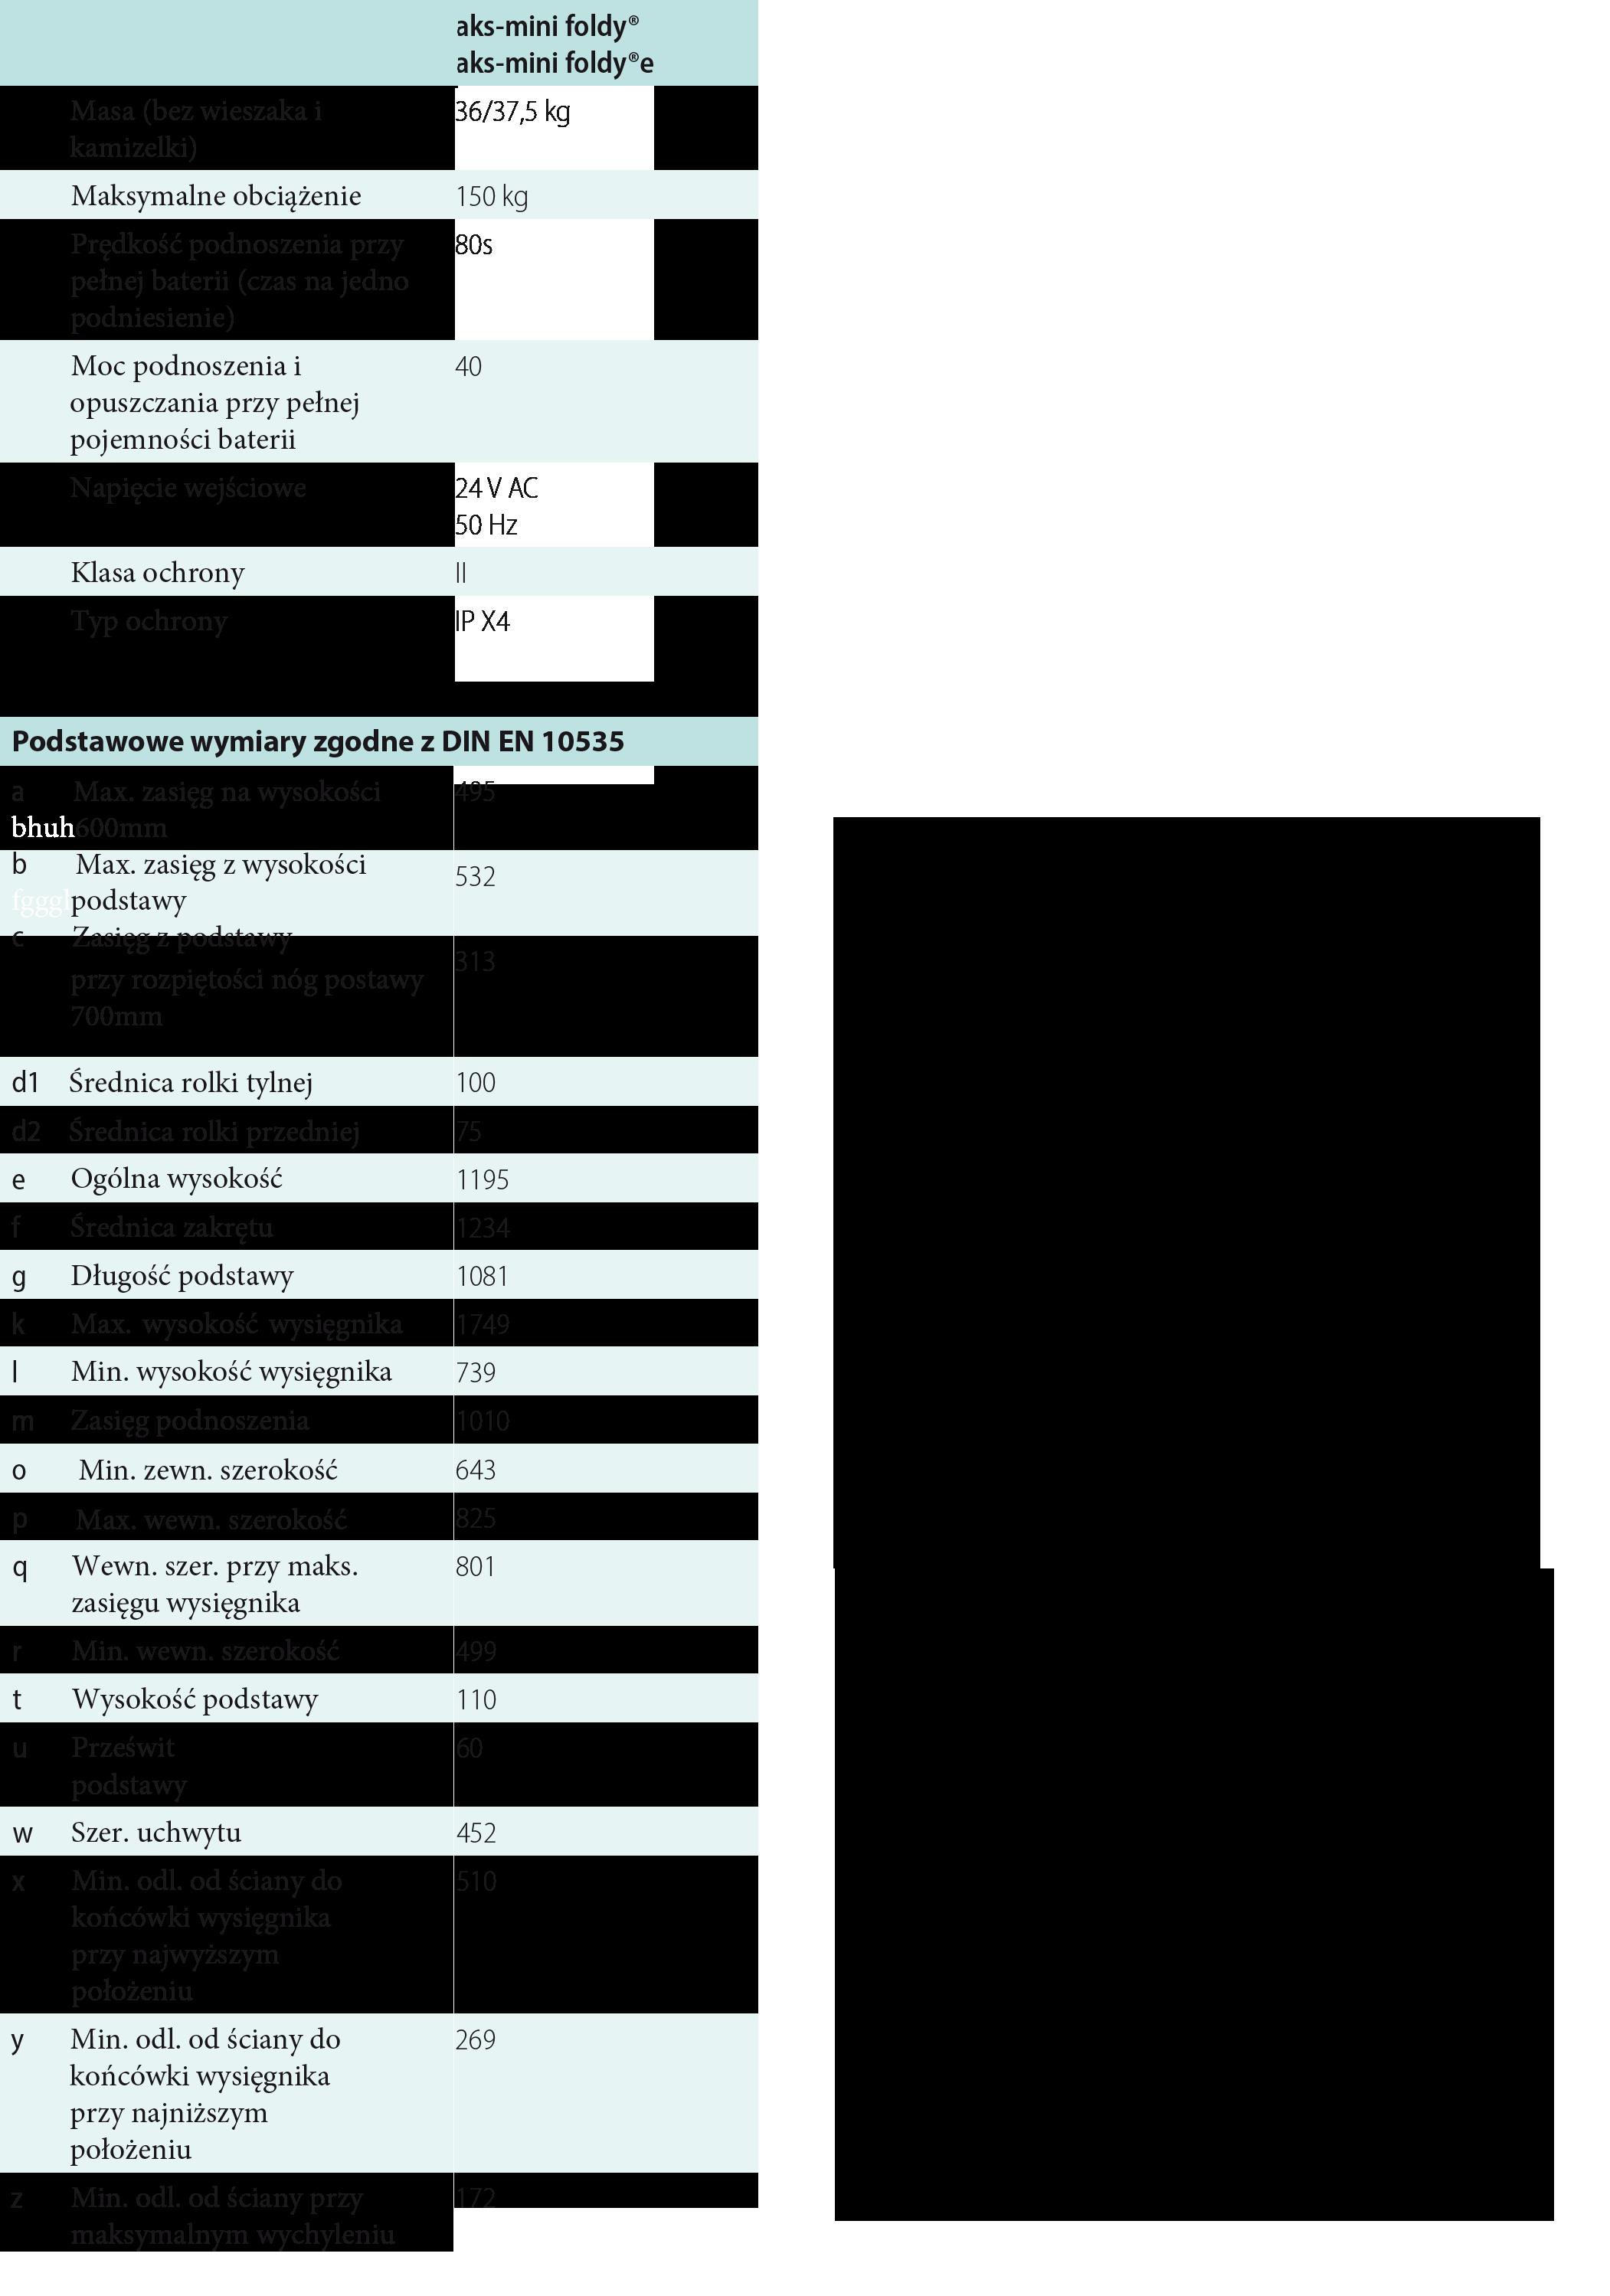 AKS-parametry-techniczne foldy mini.png